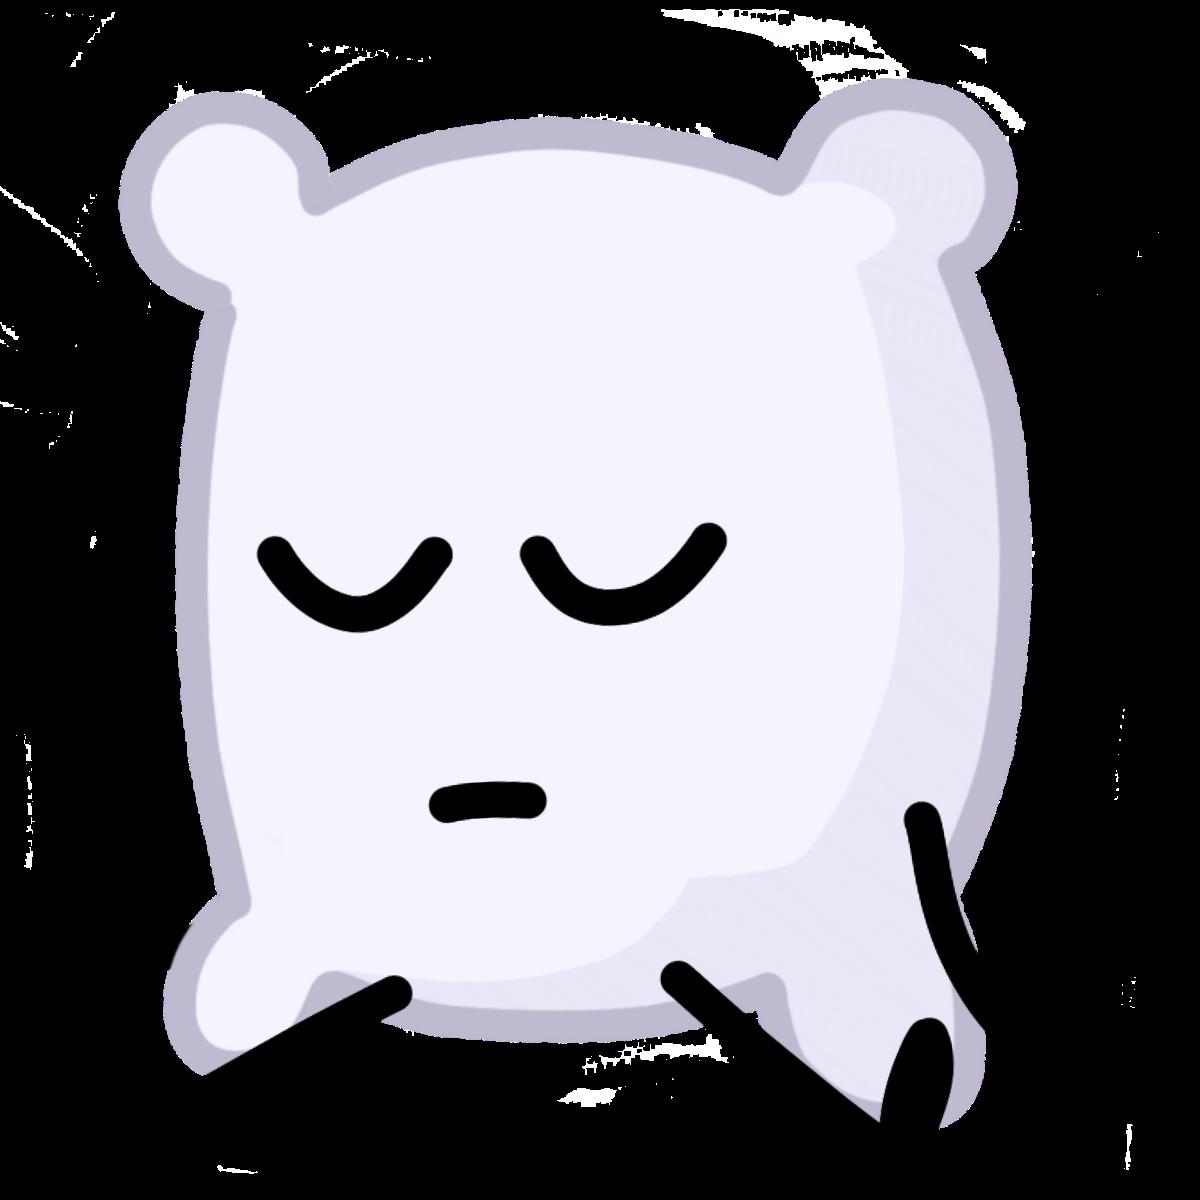 Pillow (Object Object)